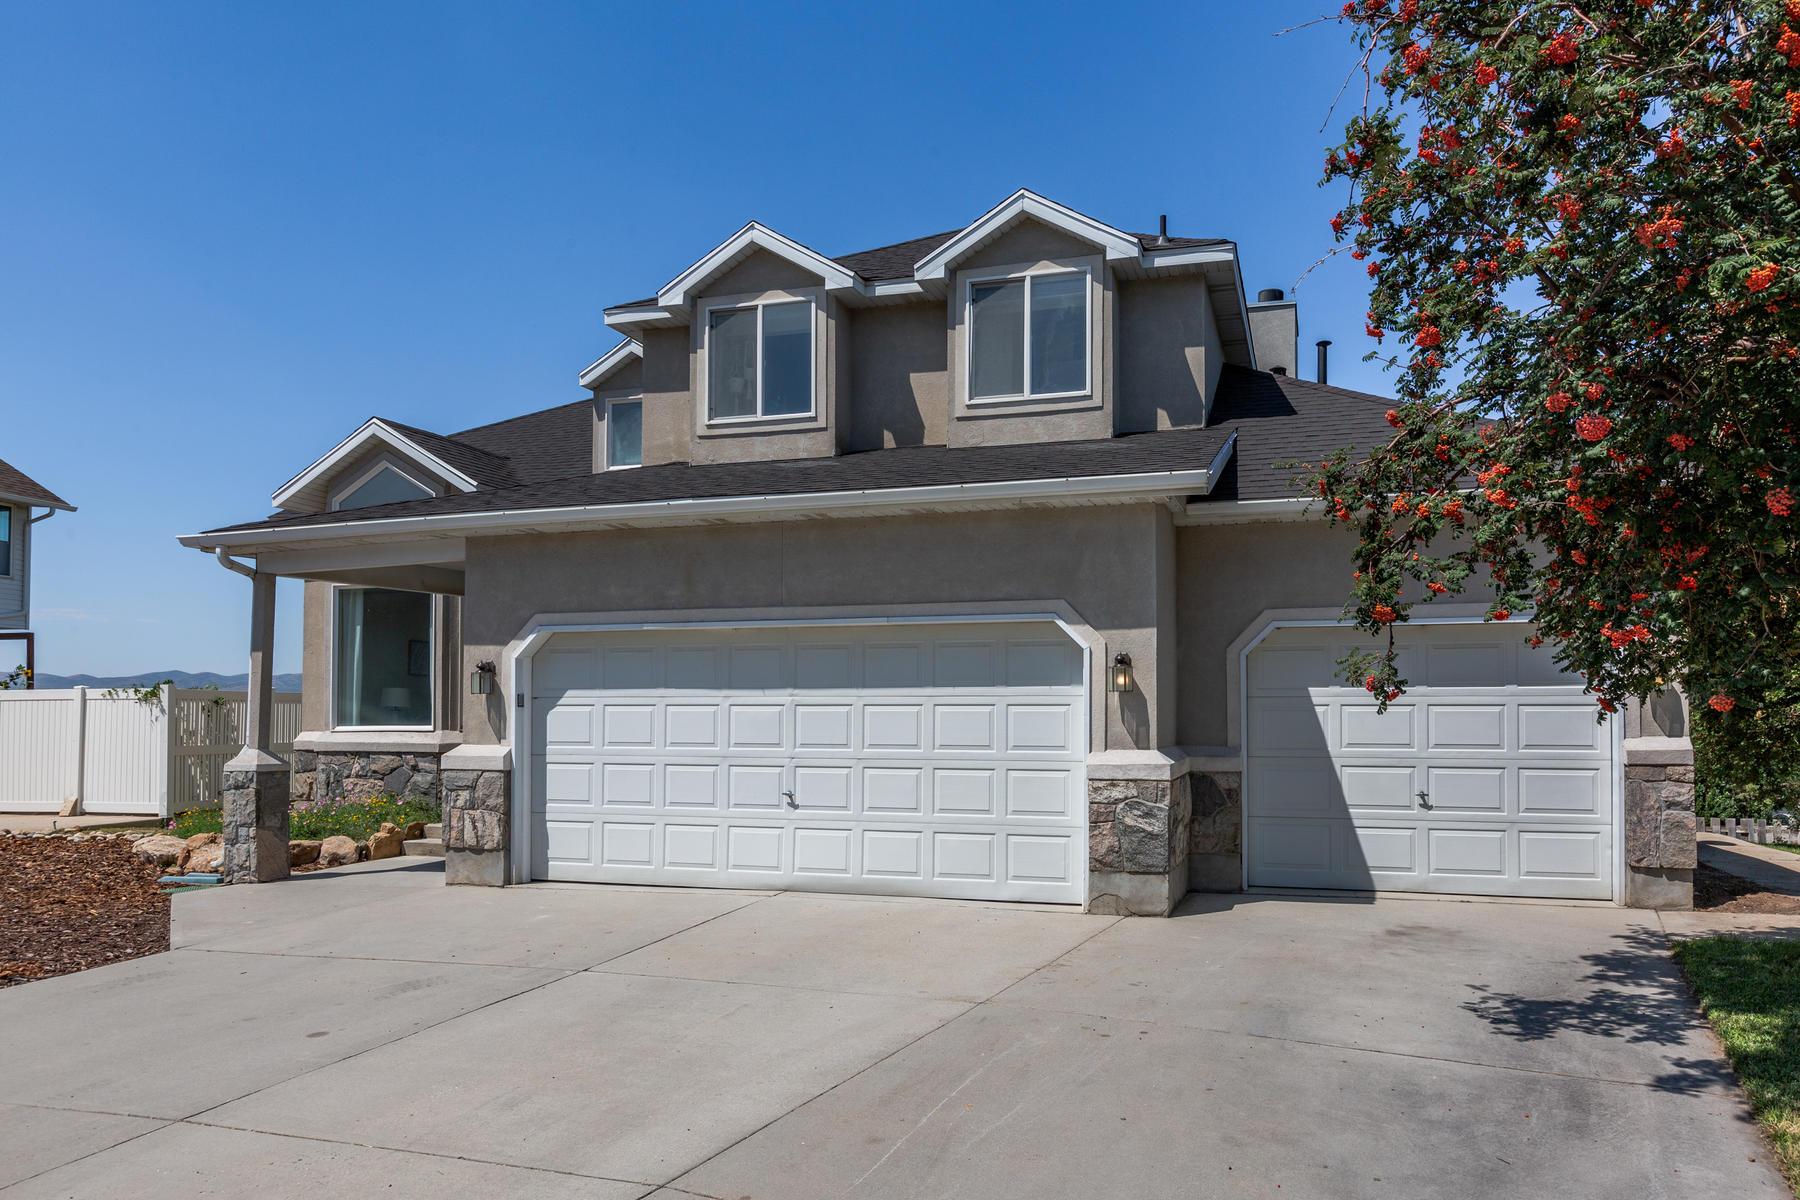 Single Family Homes için Satış at After Years of Loving This Home as Their Own 11892 Bluff View Drive, Sandy, Utah 84092 Amerika Birleşik Devletleri